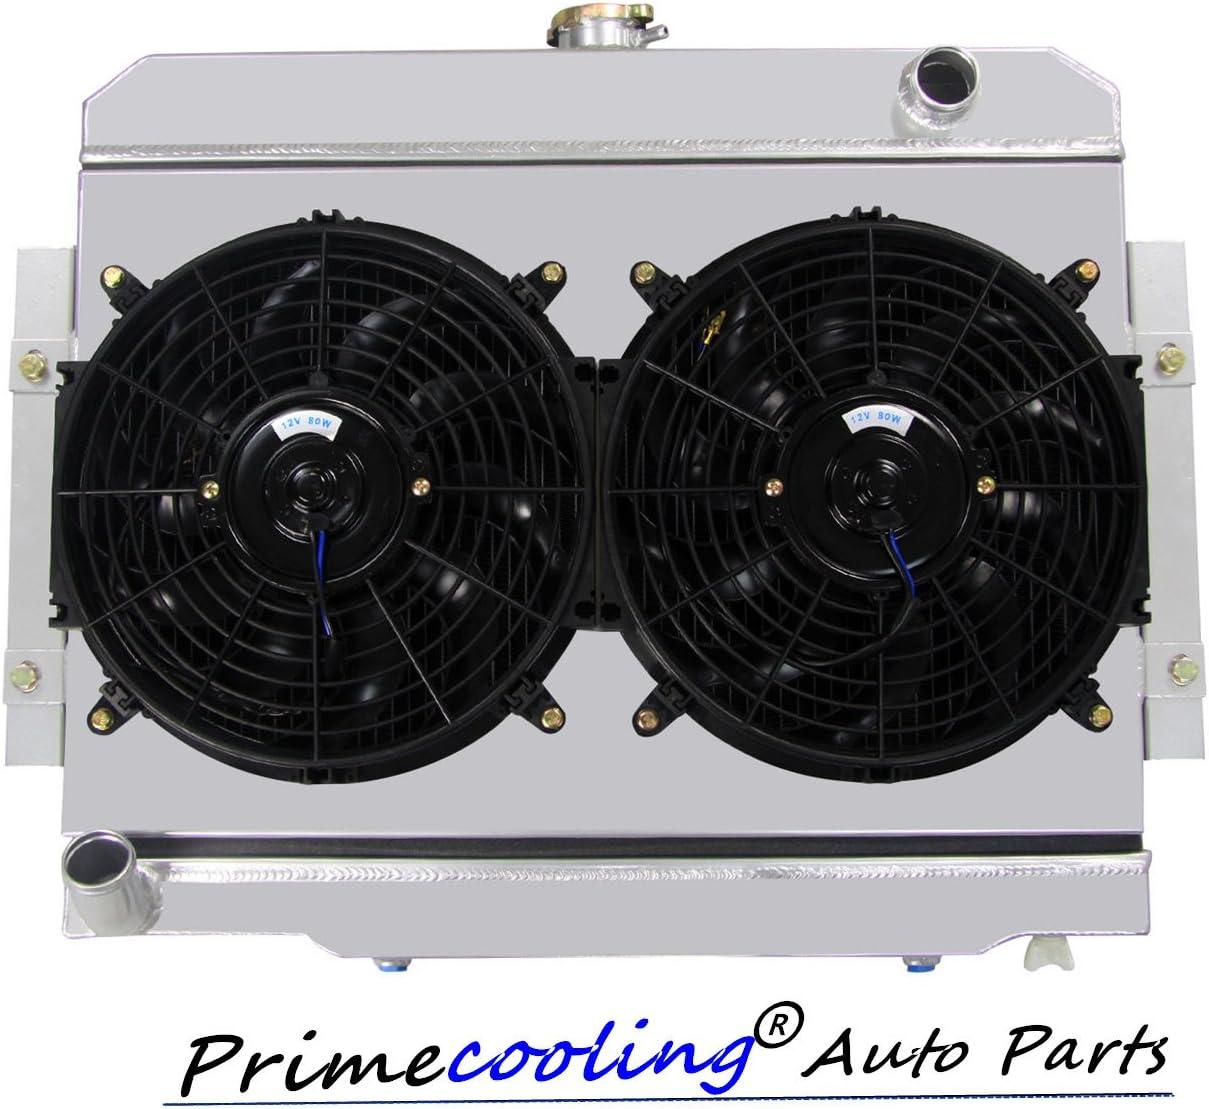 "Primecooling 52MM 3 Row Core Aluminum Radiator +2X12"" Fan w/Shroud for Jeep CJ5 CJ6 CJ7 1972-86, Cherokee J10 Commando 1973-75"